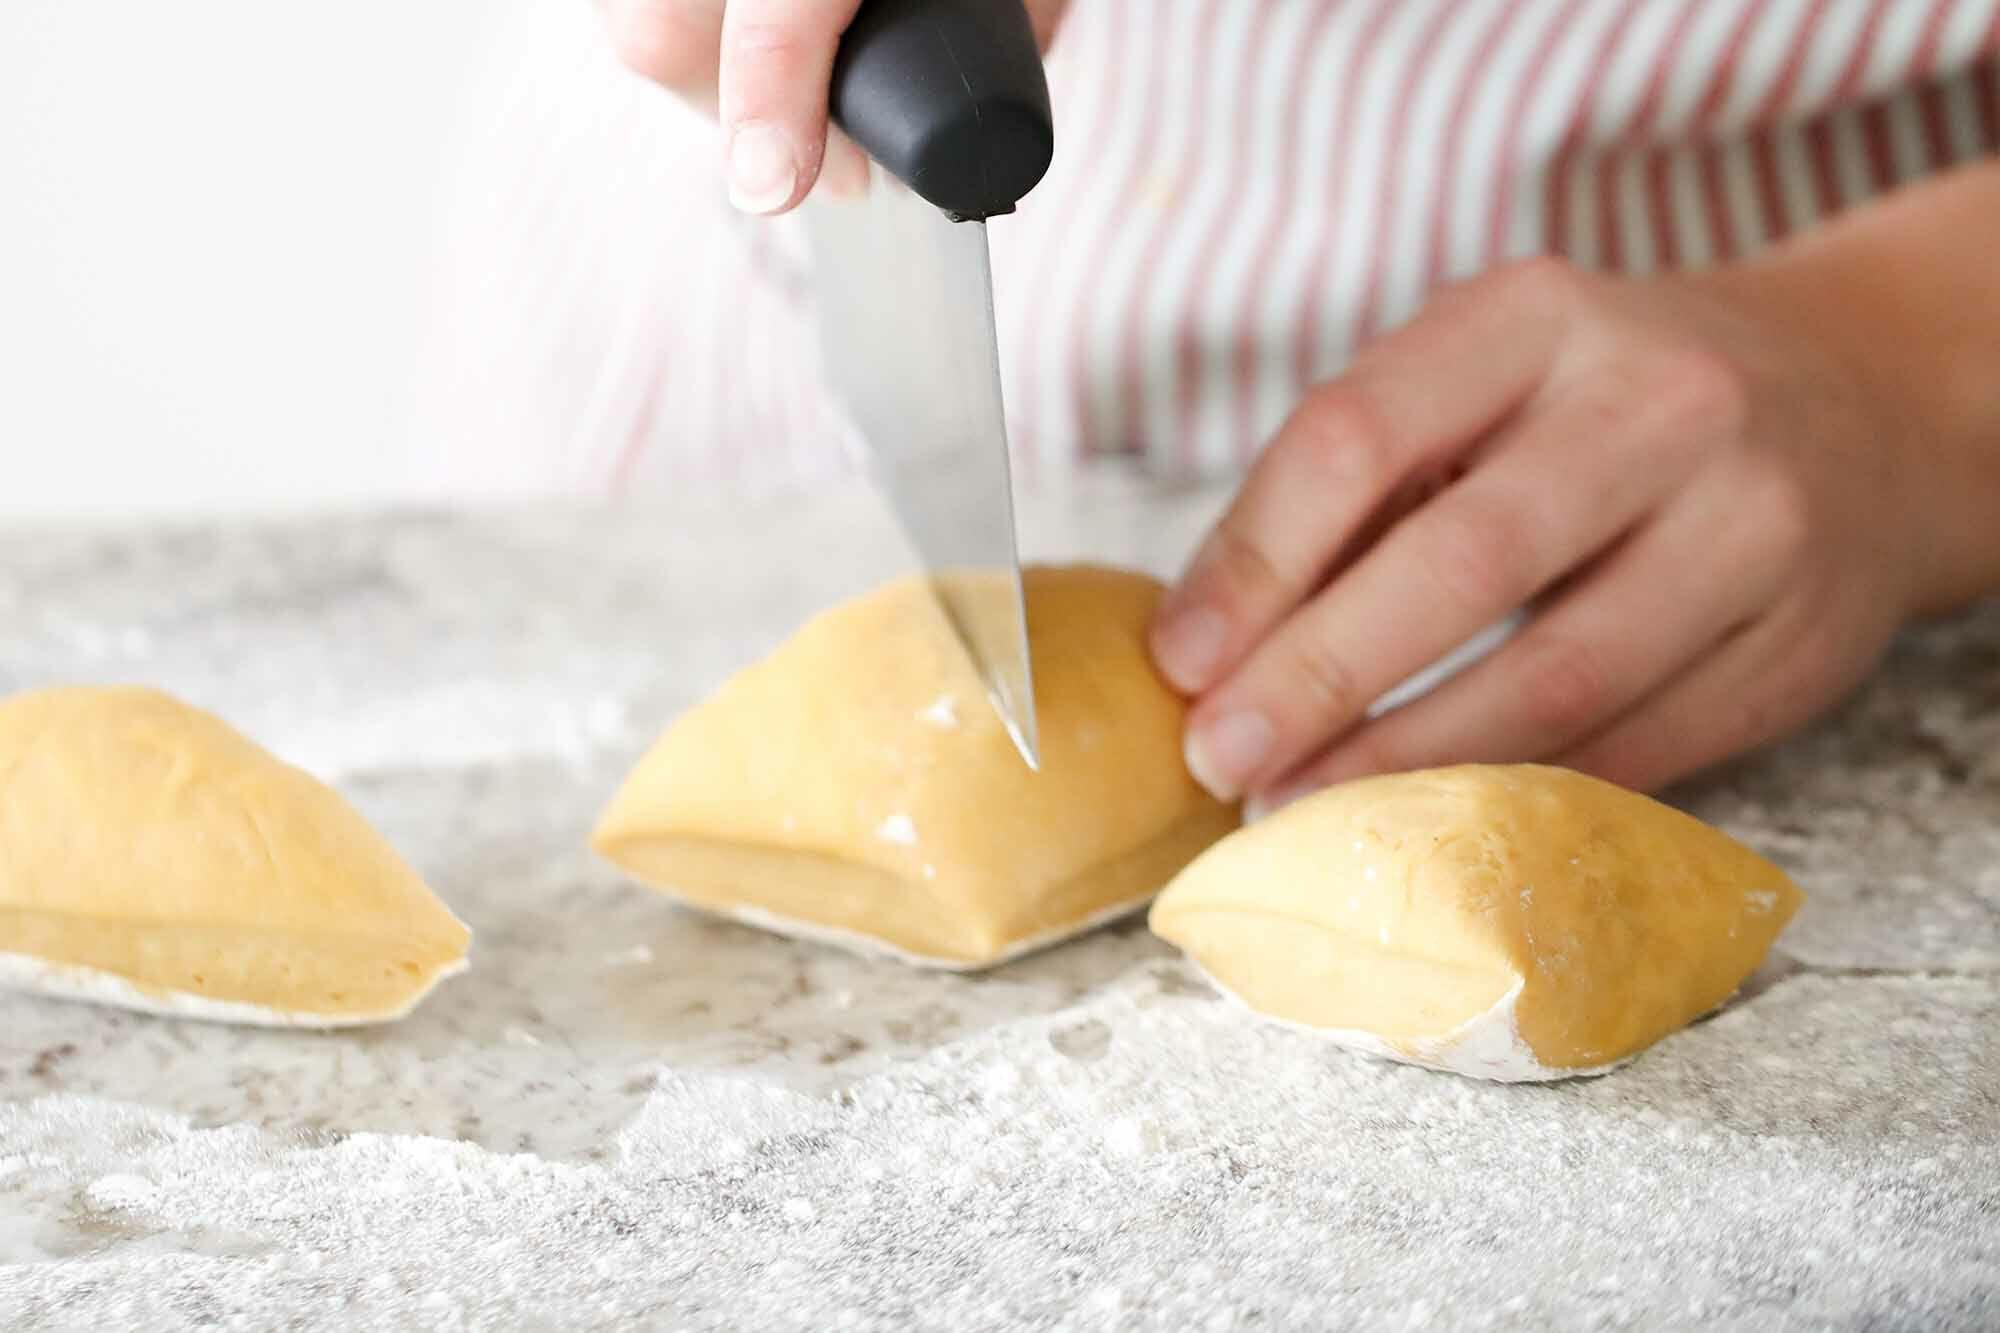 How to Make Homemade Pasta cut the dough into pieces